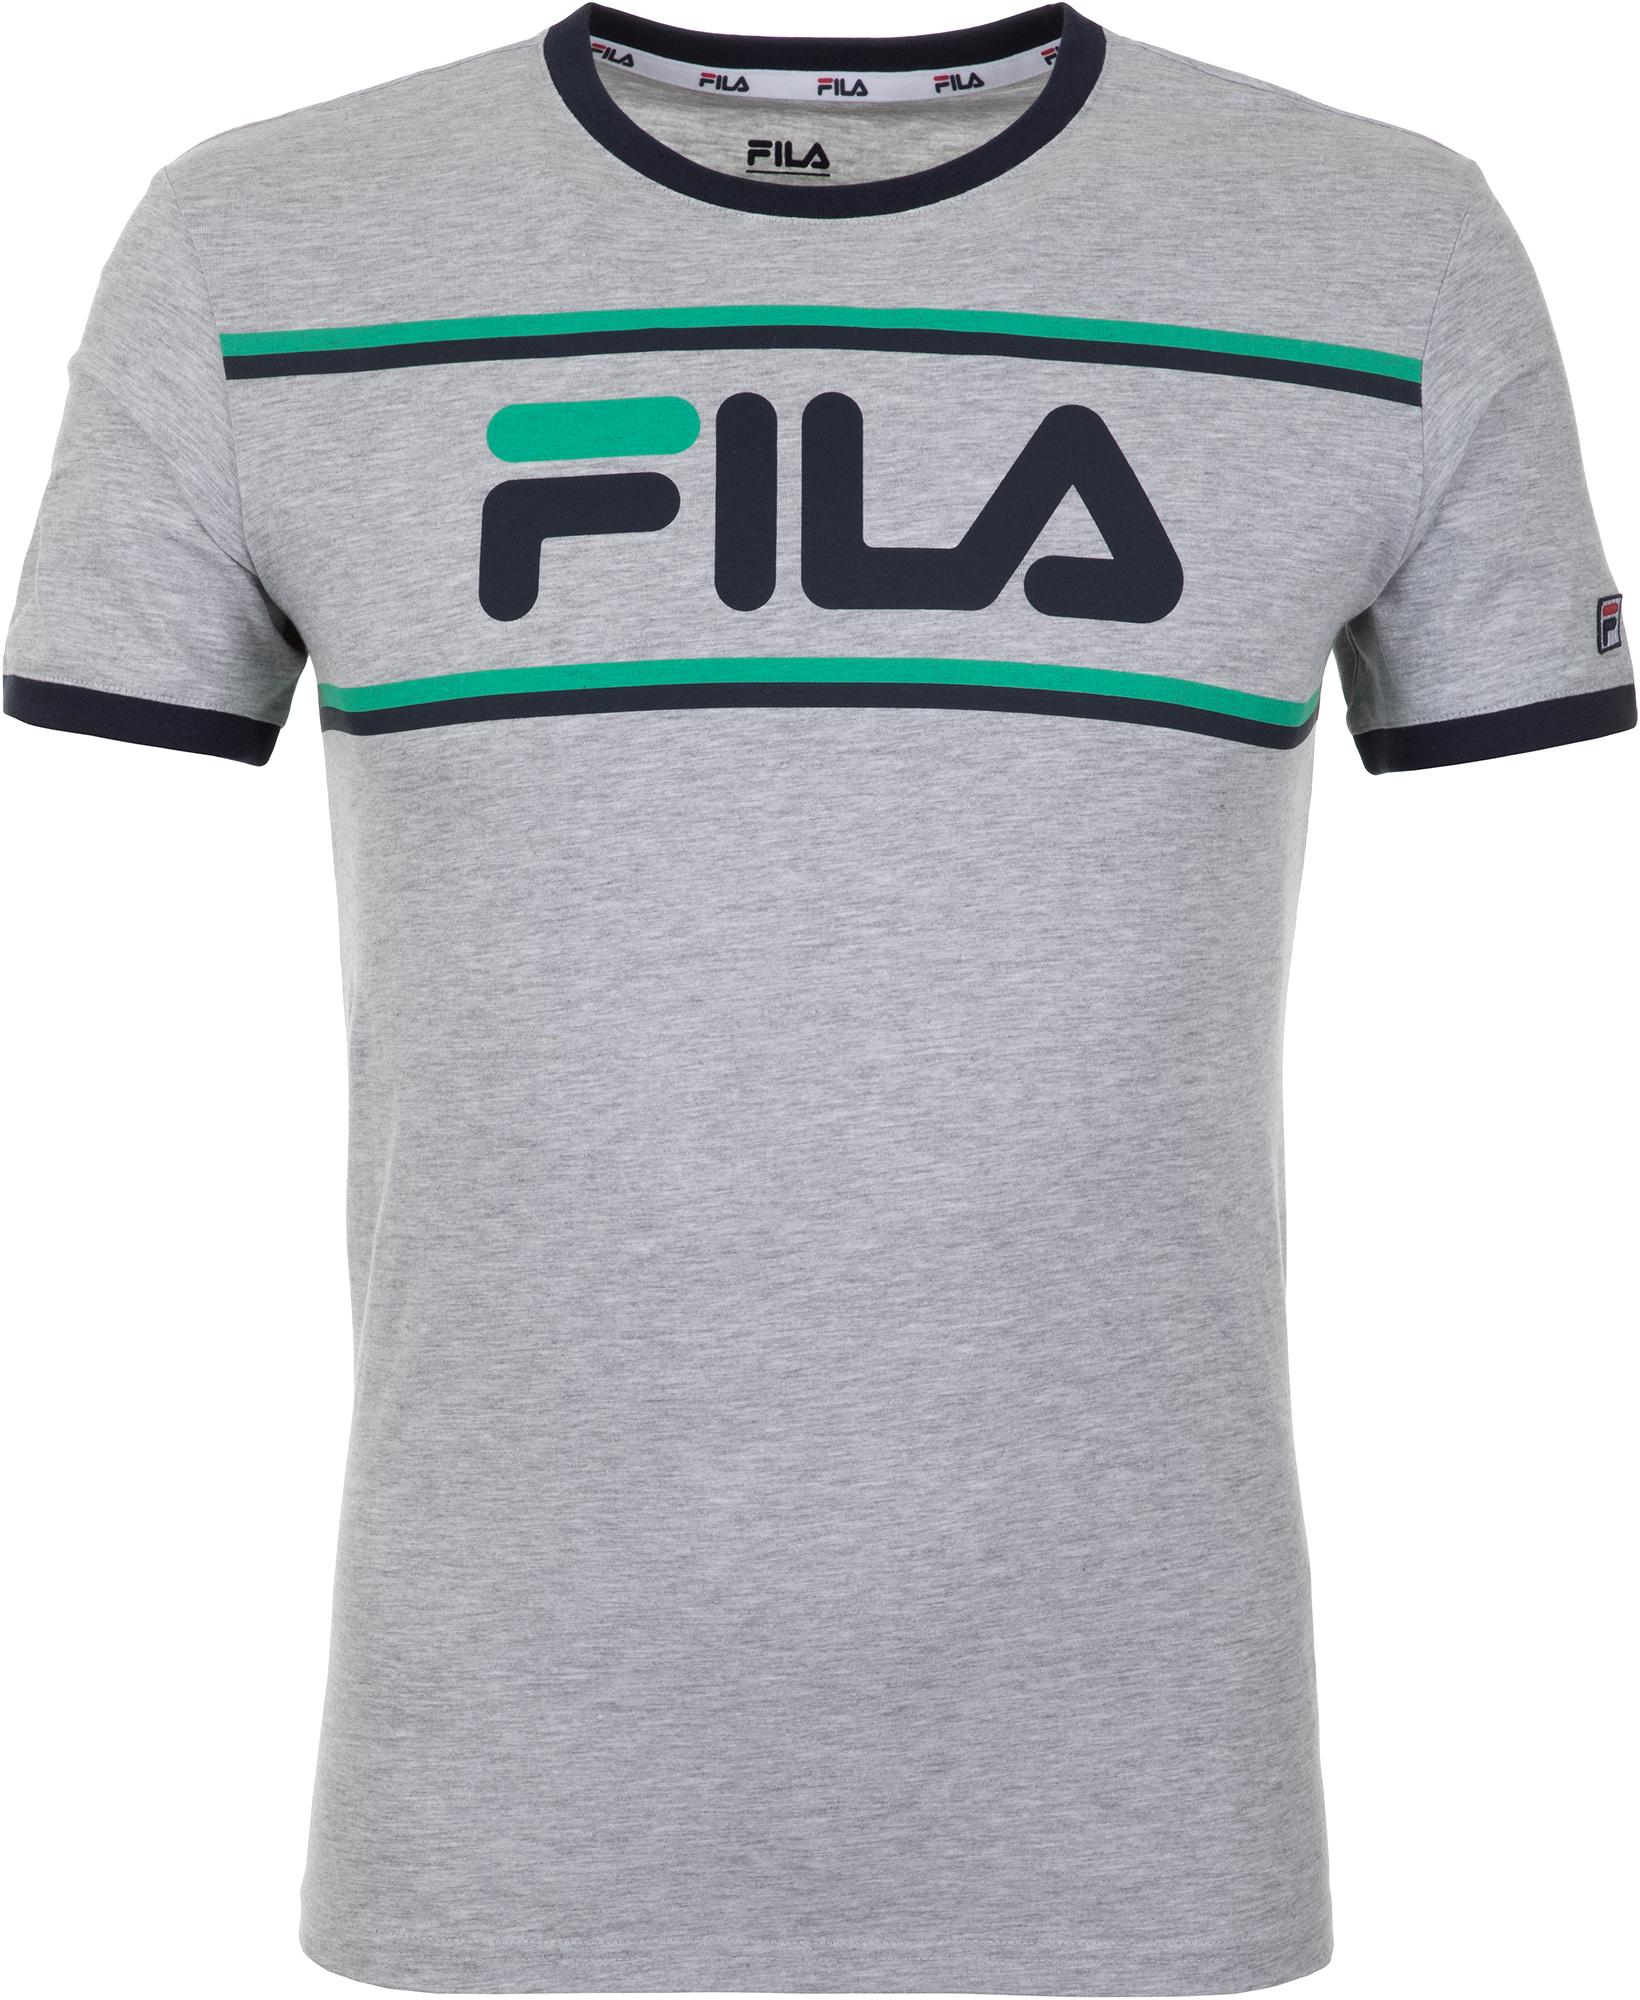 Fila Футболка мужская Fila, размер 56